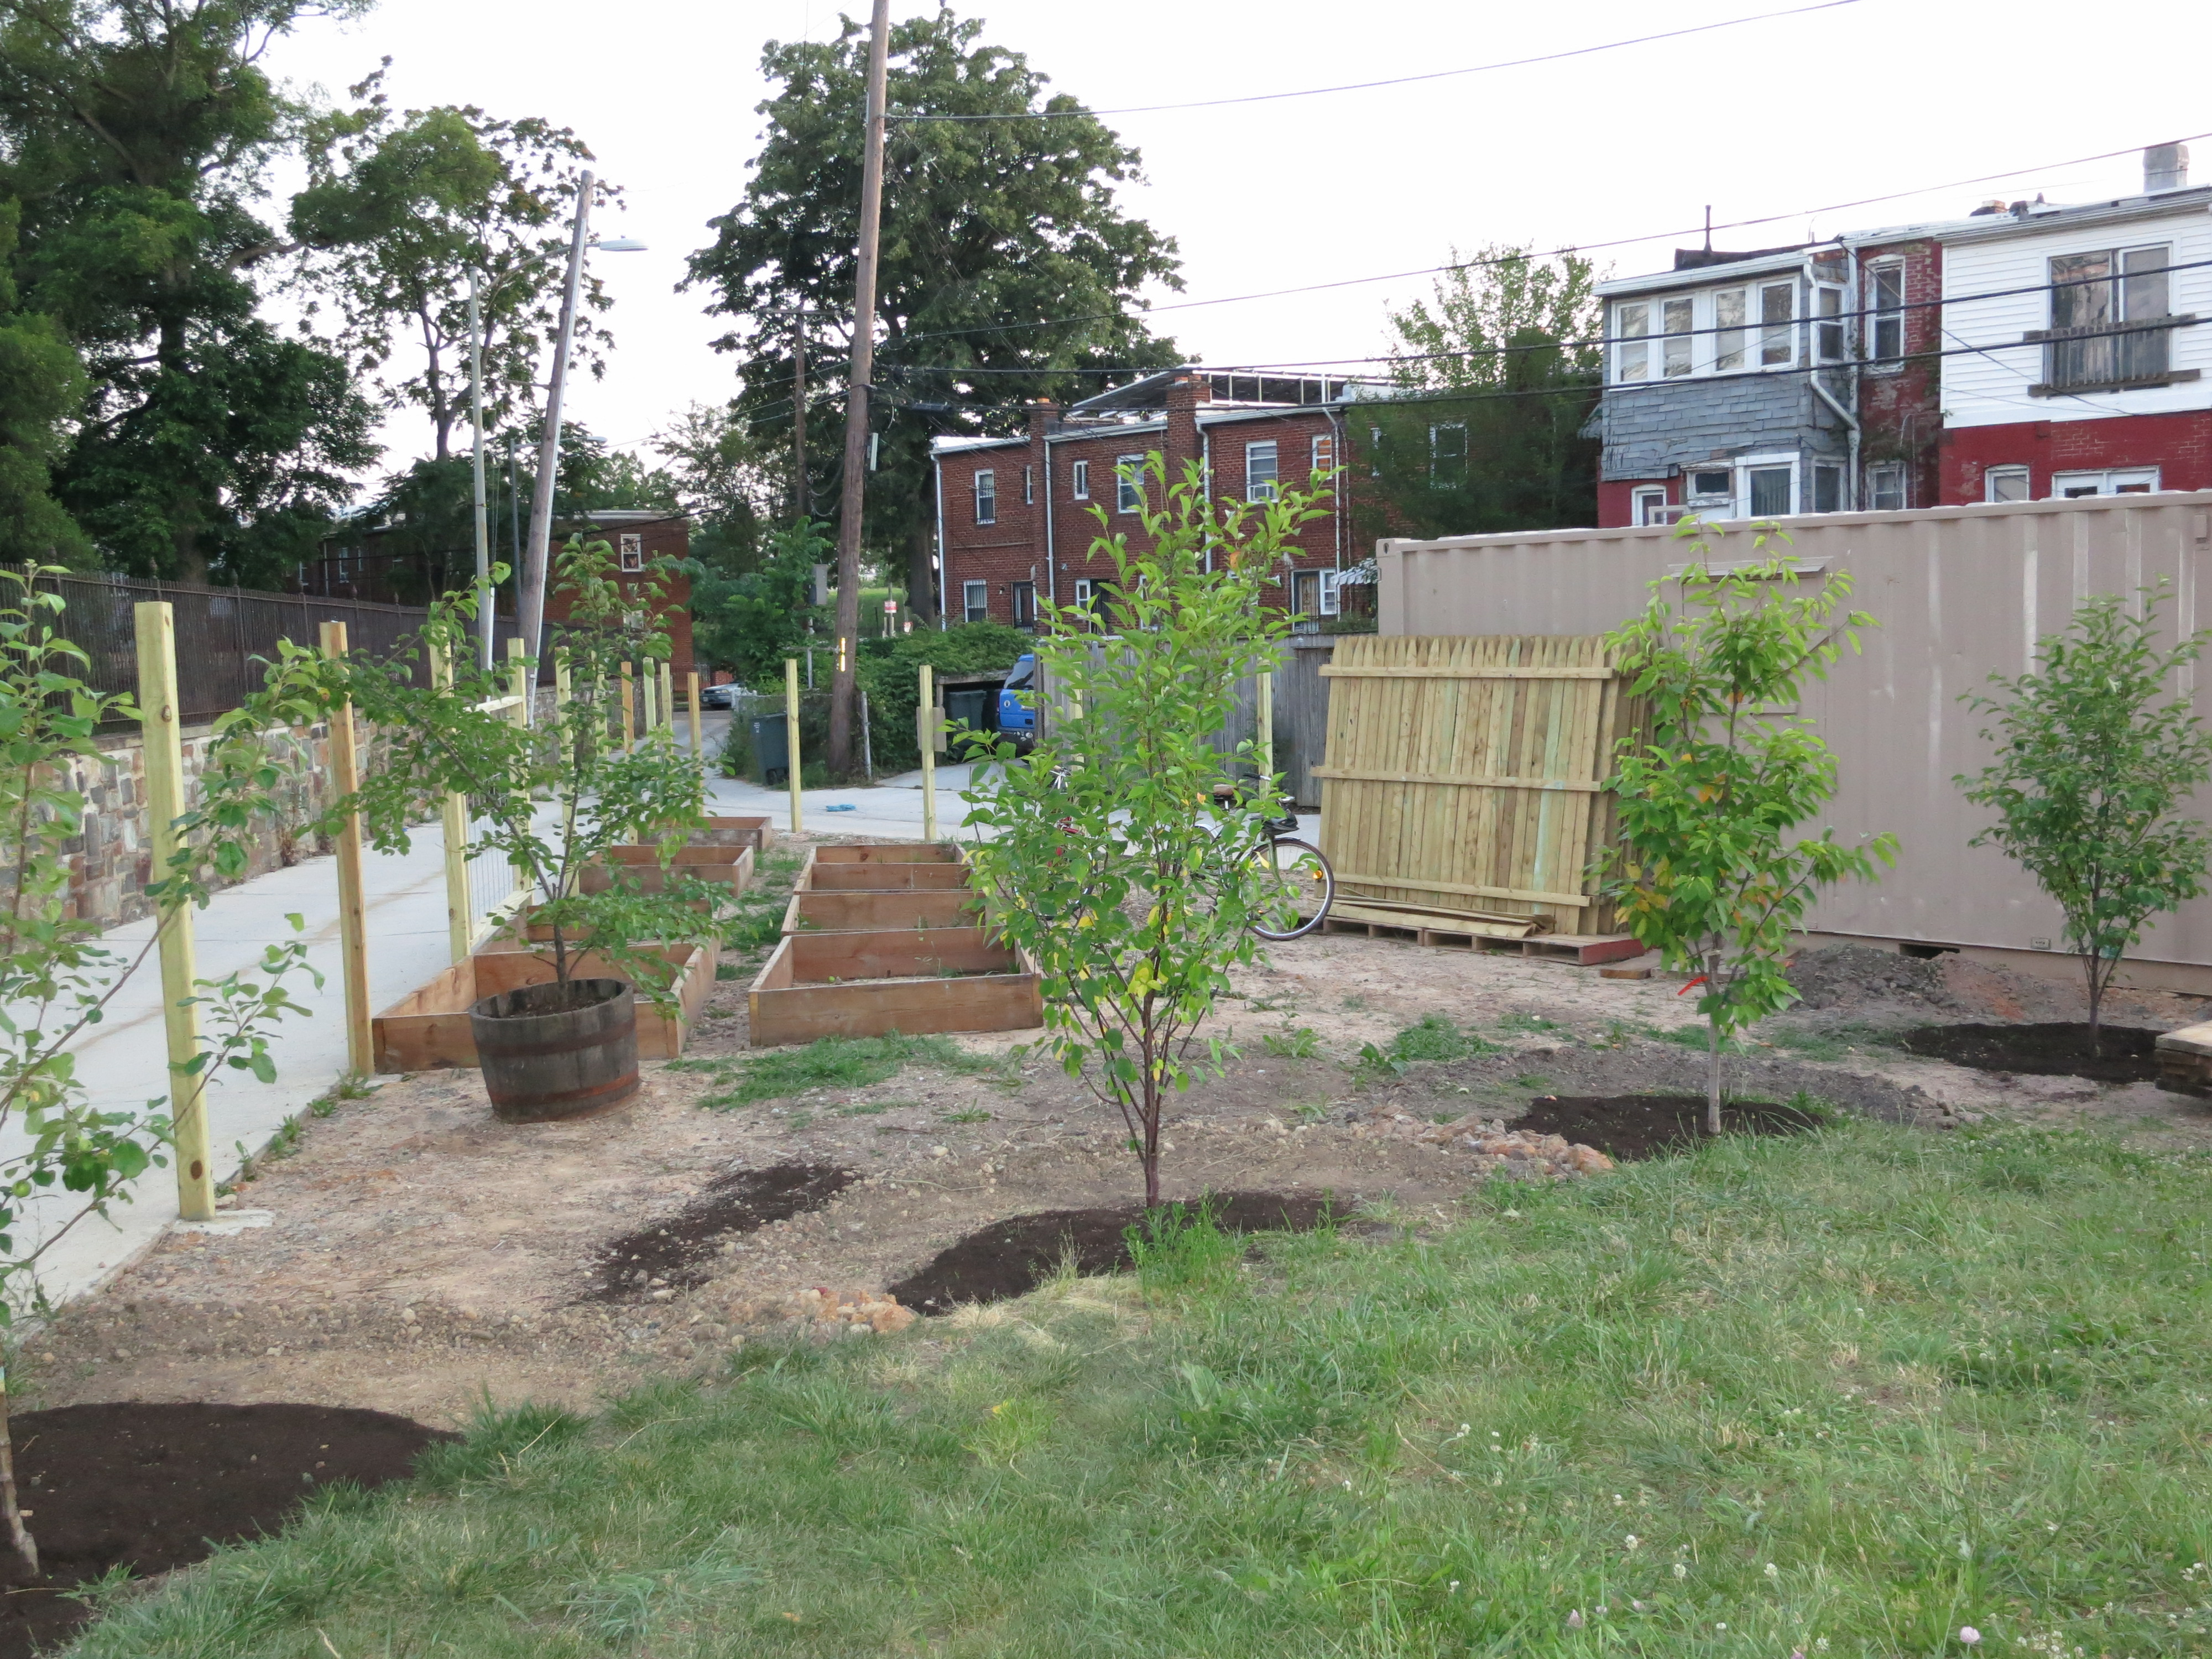 Brian builds 10 garden beds, installs first bunch of fruit trees